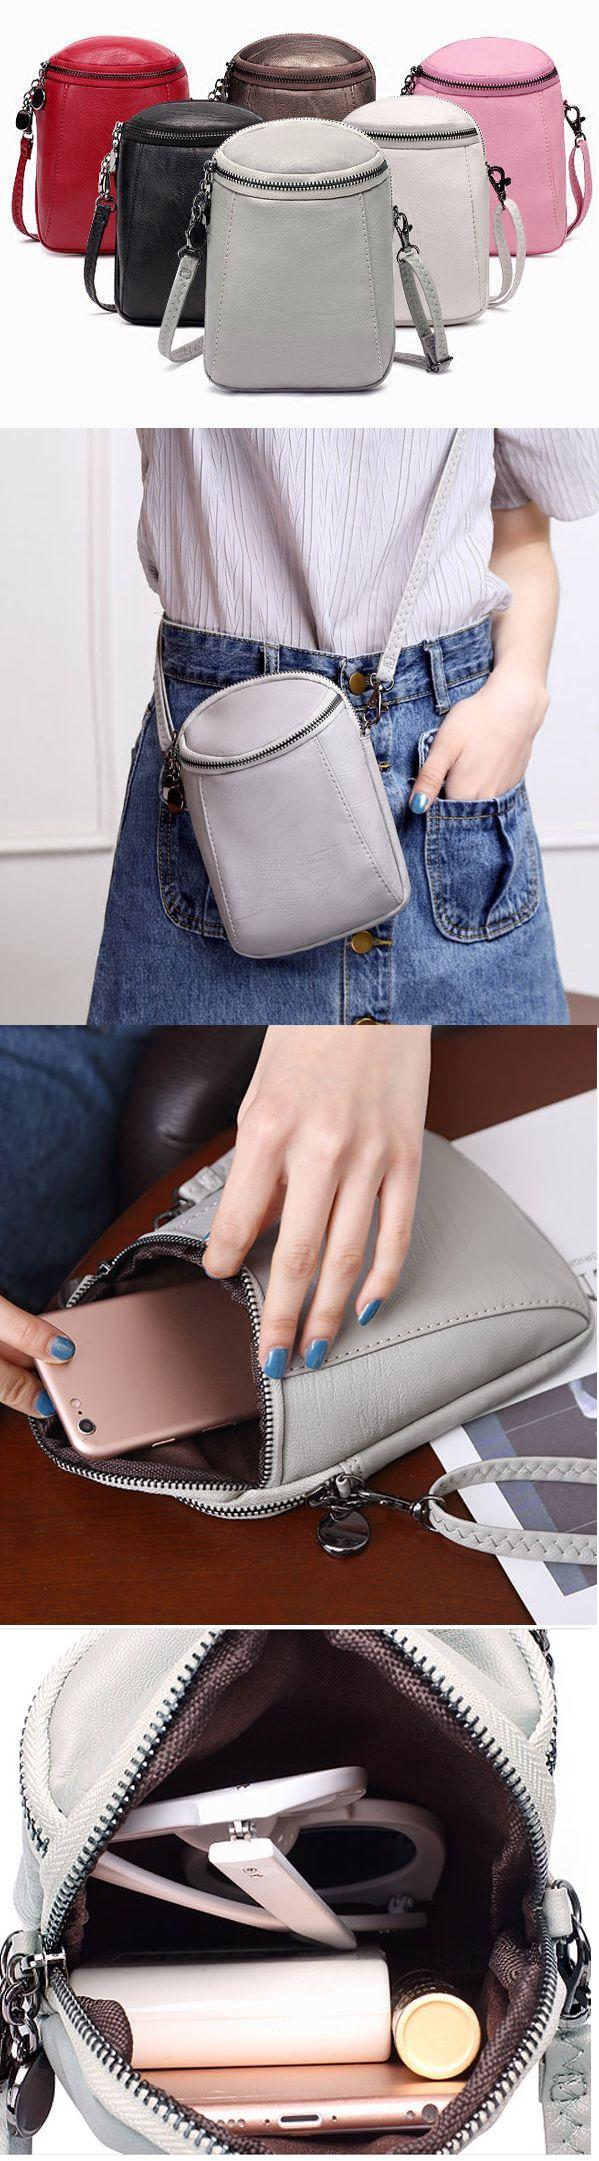 US$7.99 Woman Round Little Phone Bag Casual PU Crossbody Bag Bucket Bag Vintage Bag